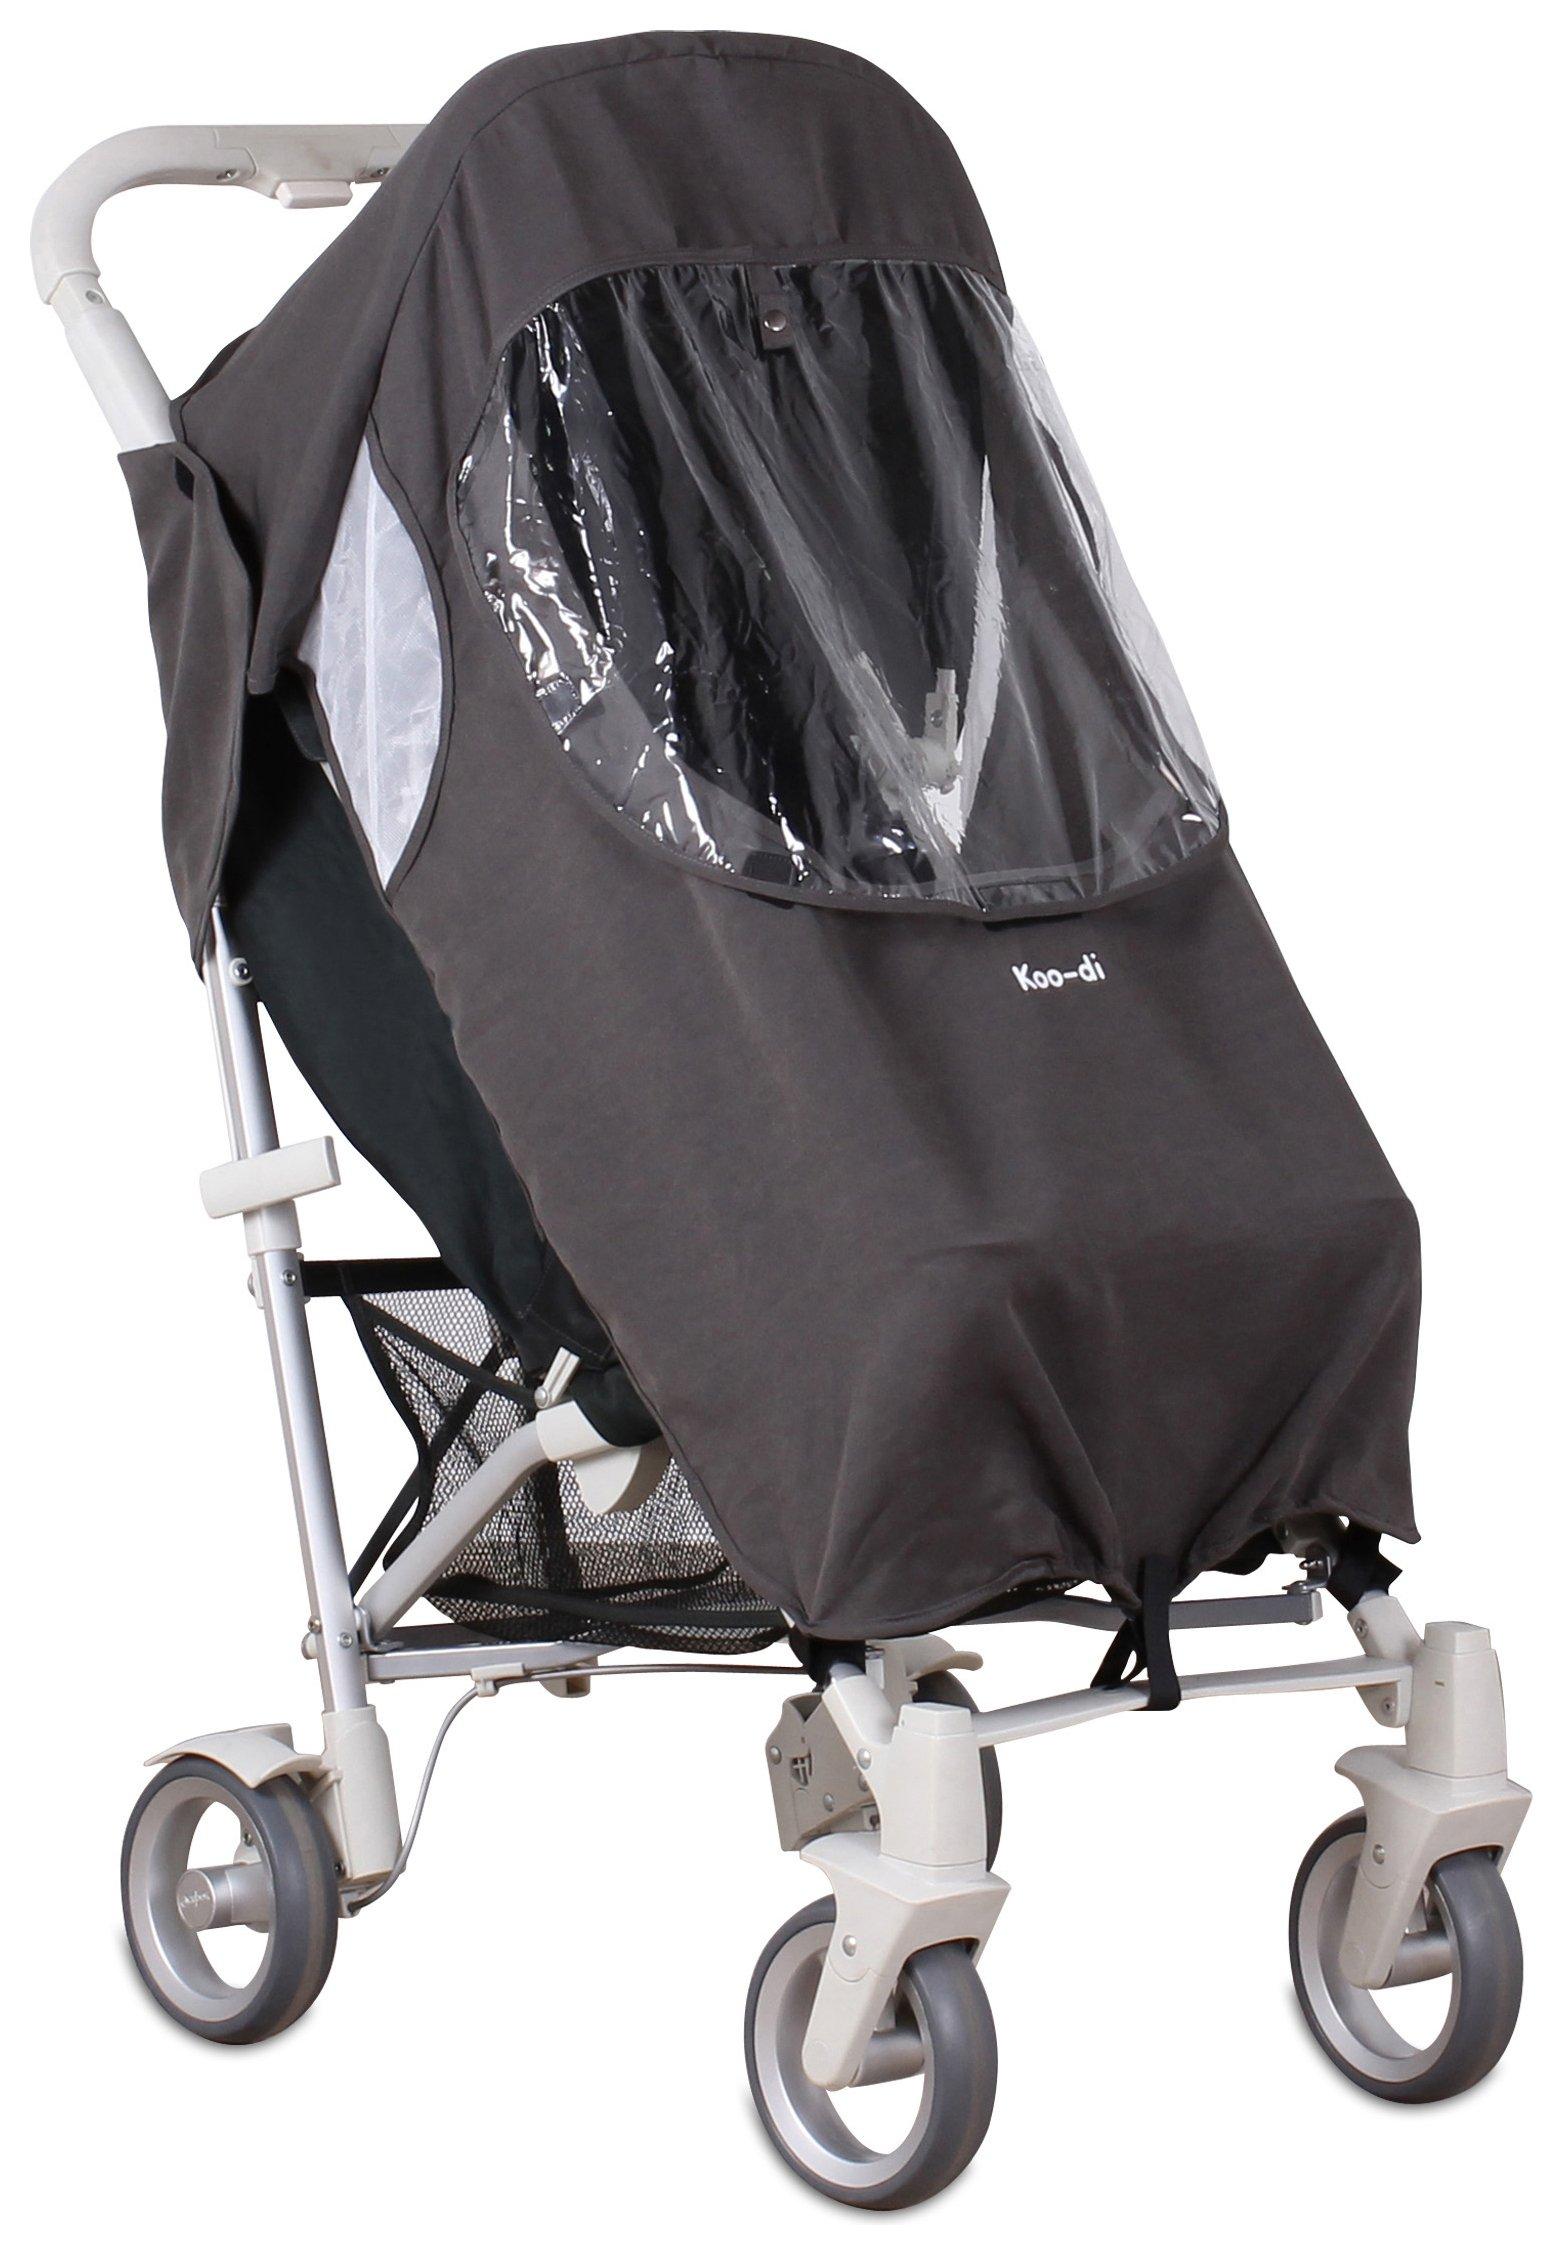 Image of Koo-di Pack-It Universal - Pushchair Raincover - Grey